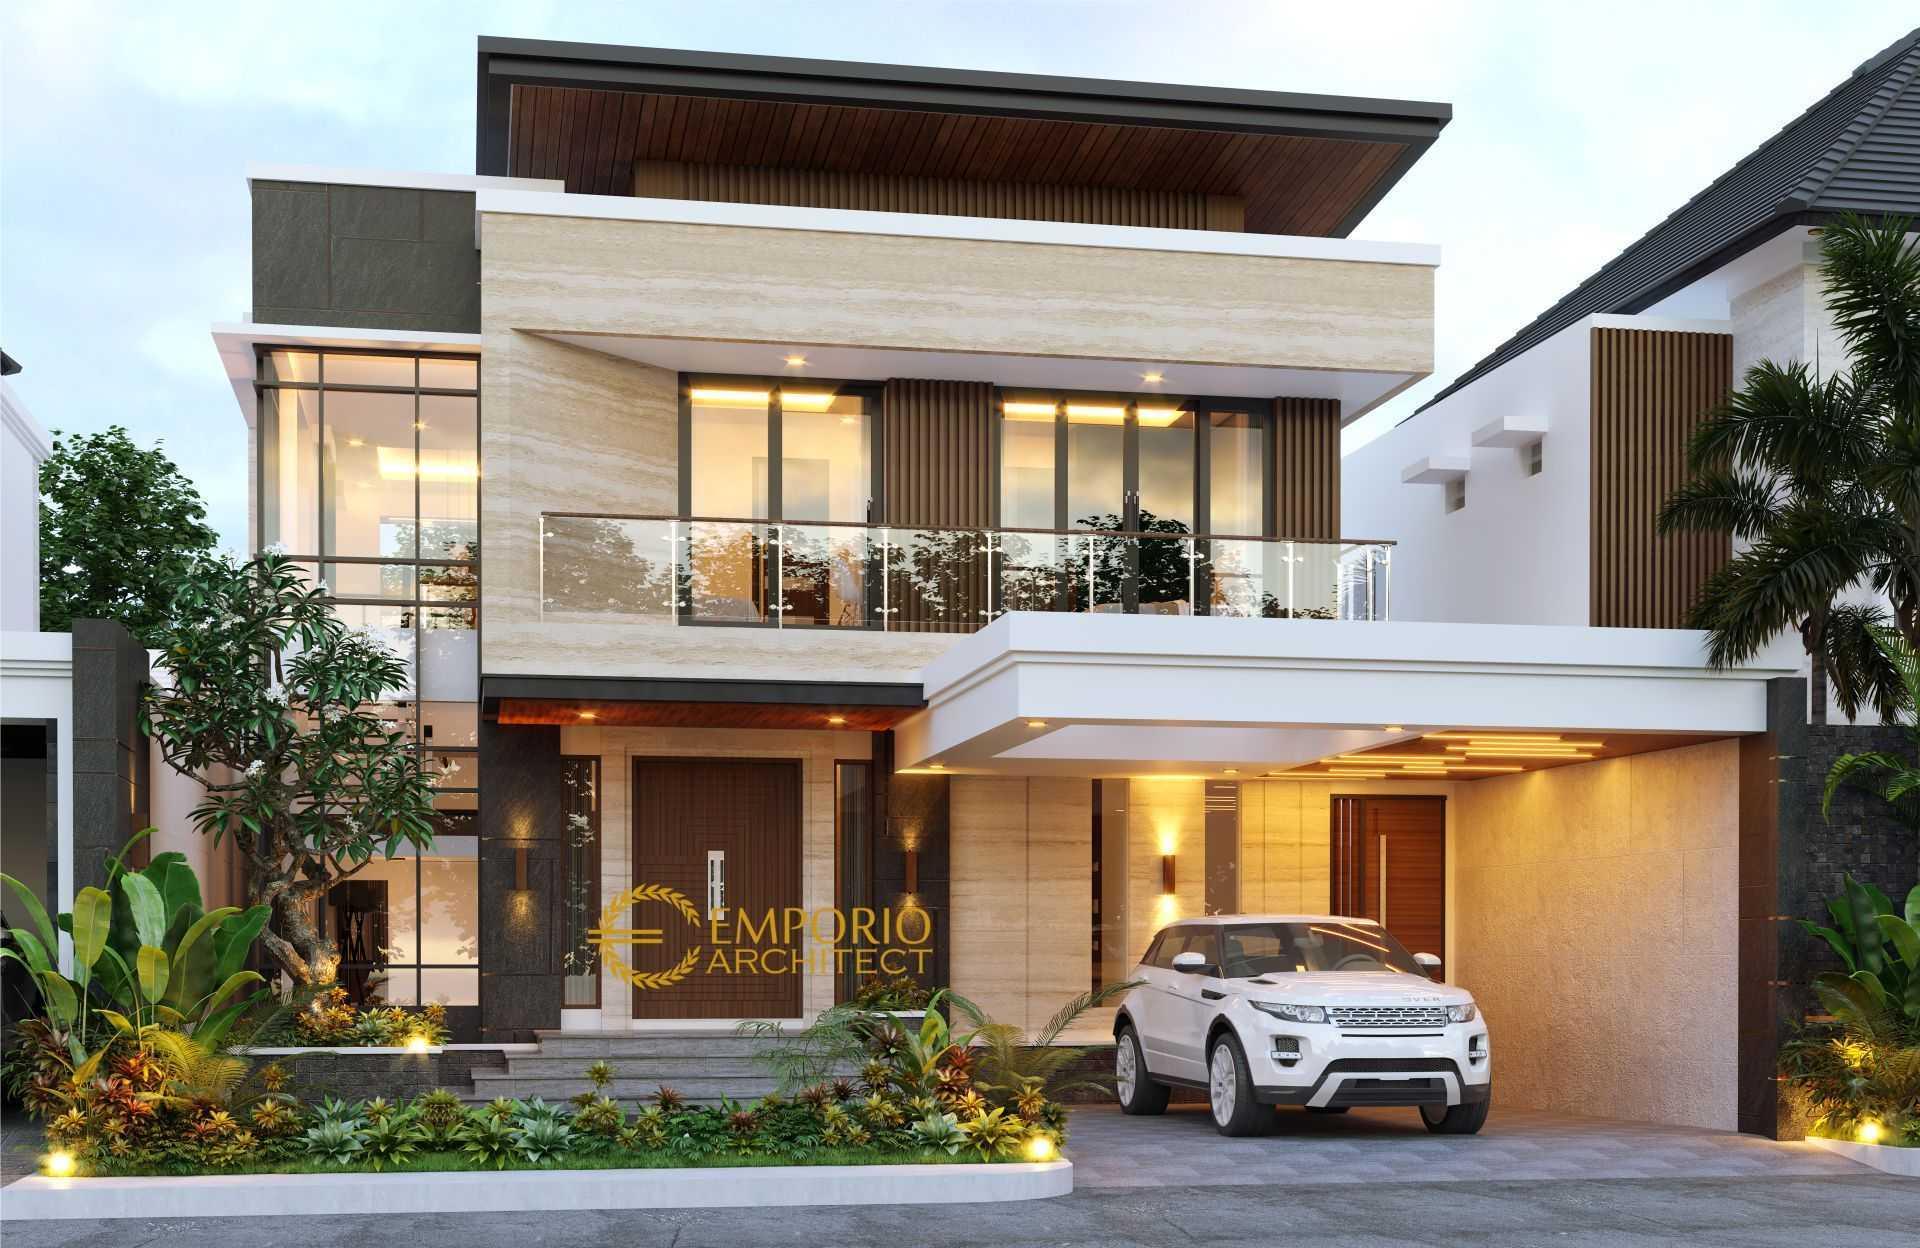 Emporio Architect Jasa Arsitek Pekanbaru Desain Rumah Modern 2 Lantai 824 Di Pekanbaru, Riau Pekanbaru, Kota Pekanbaru, Riau, Indonesia Pekanbaru, Kota Pekanbaru, Riau, Indonesia Emporio-Architect-Jasa-Arsitek-Pekanbaru-Desain-Rumah-Modern-2-Lantai-824-Di-Pekanbaru-Riau  94132